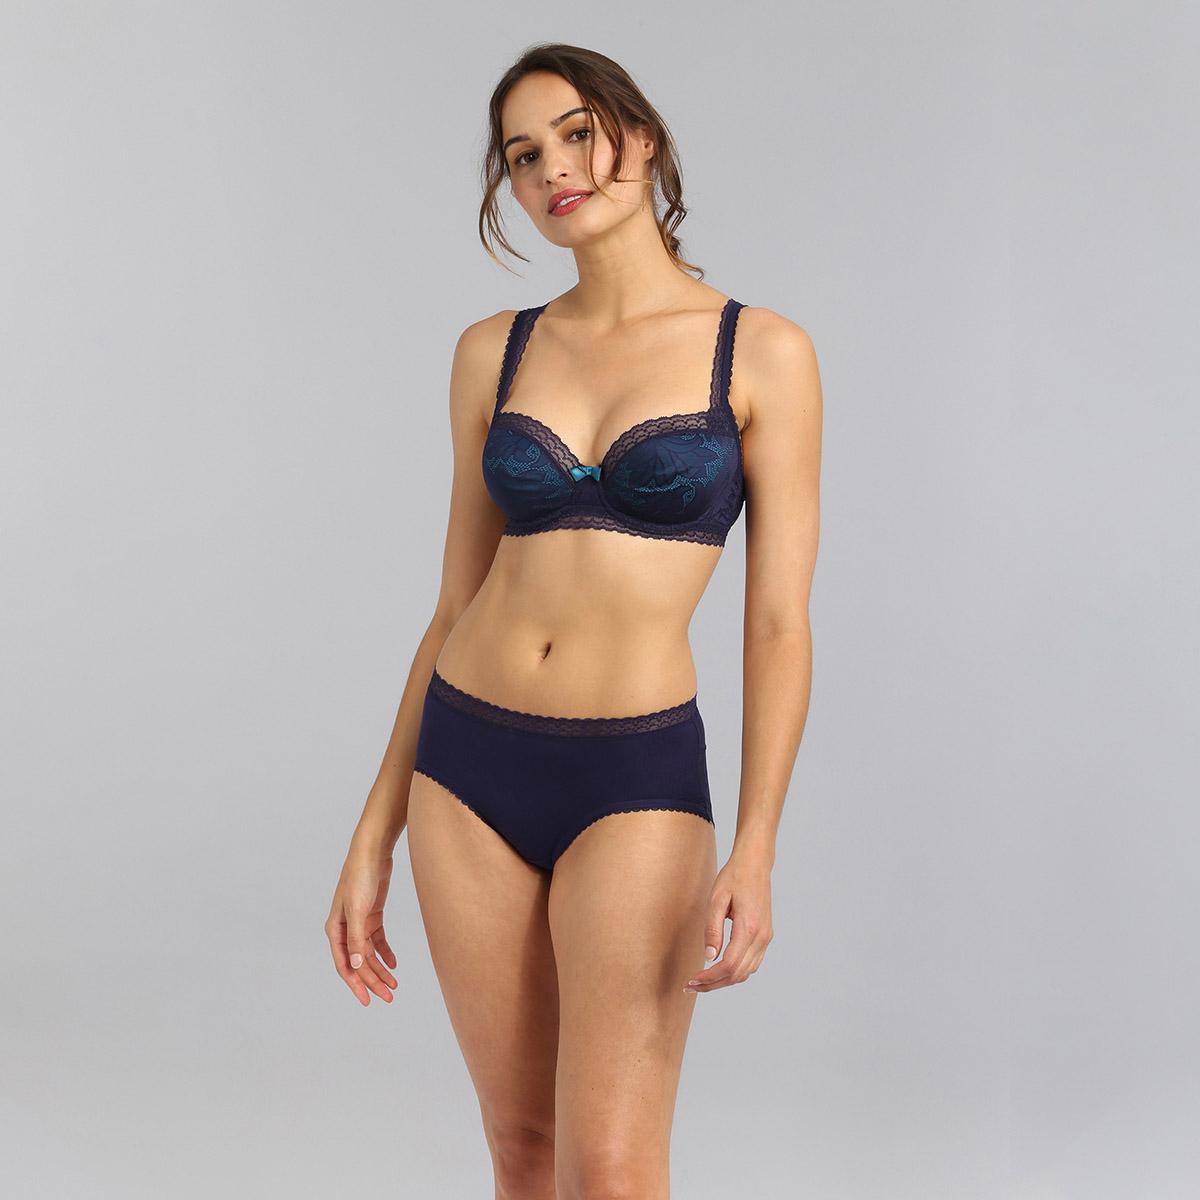 Bragas midi en azul marino Invisible Elegance, , PLAYTEX